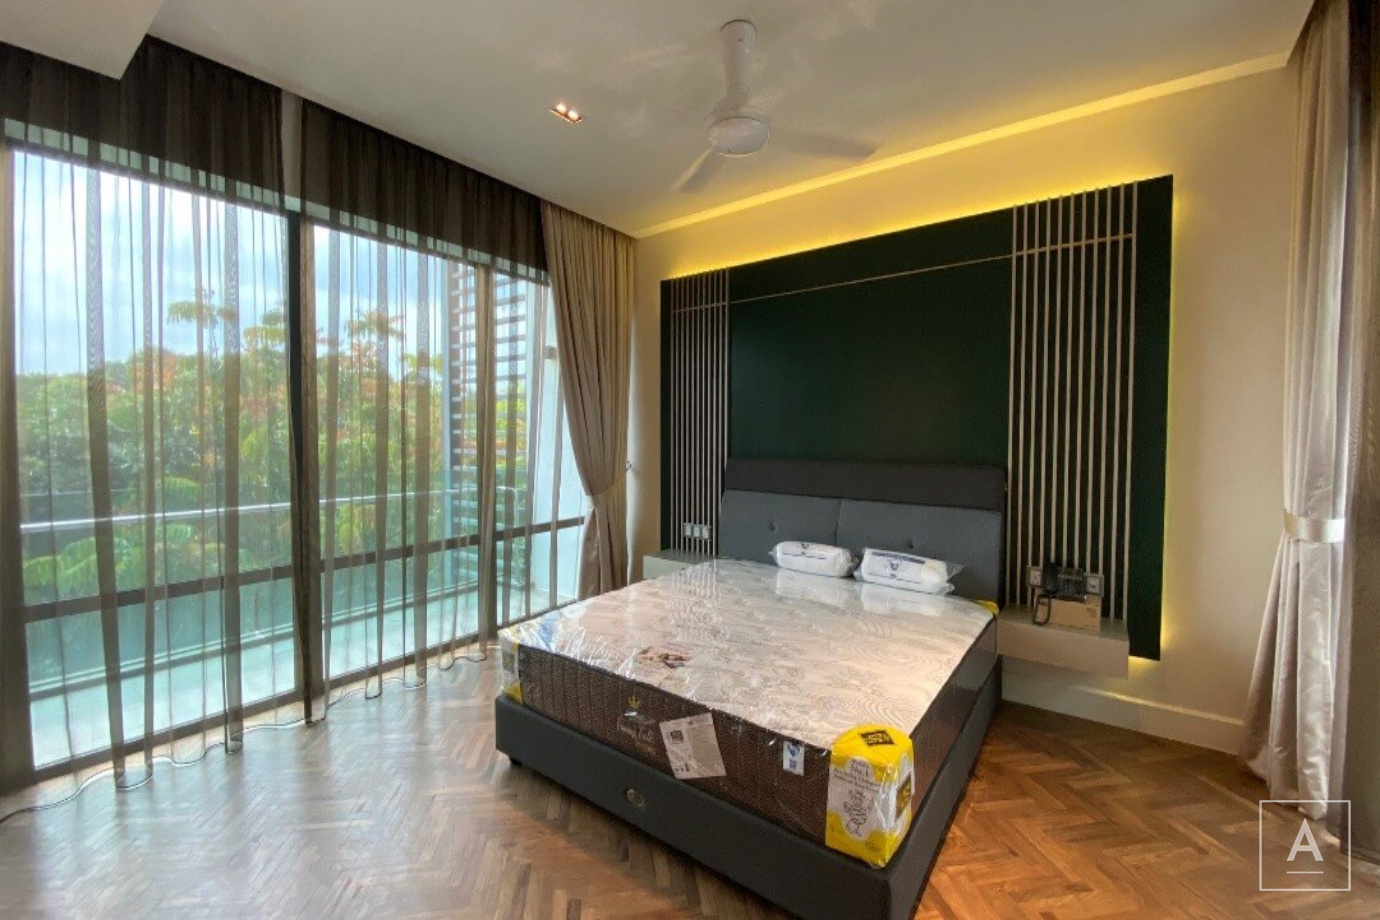 East Residence, KLGCC, Mont Kiara,Kuala Lumpur, 5 Bedrooms Bedrooms, ,7 BathroomsBathrooms,Terrace / Link,For Sale,Mont Kiara,2146